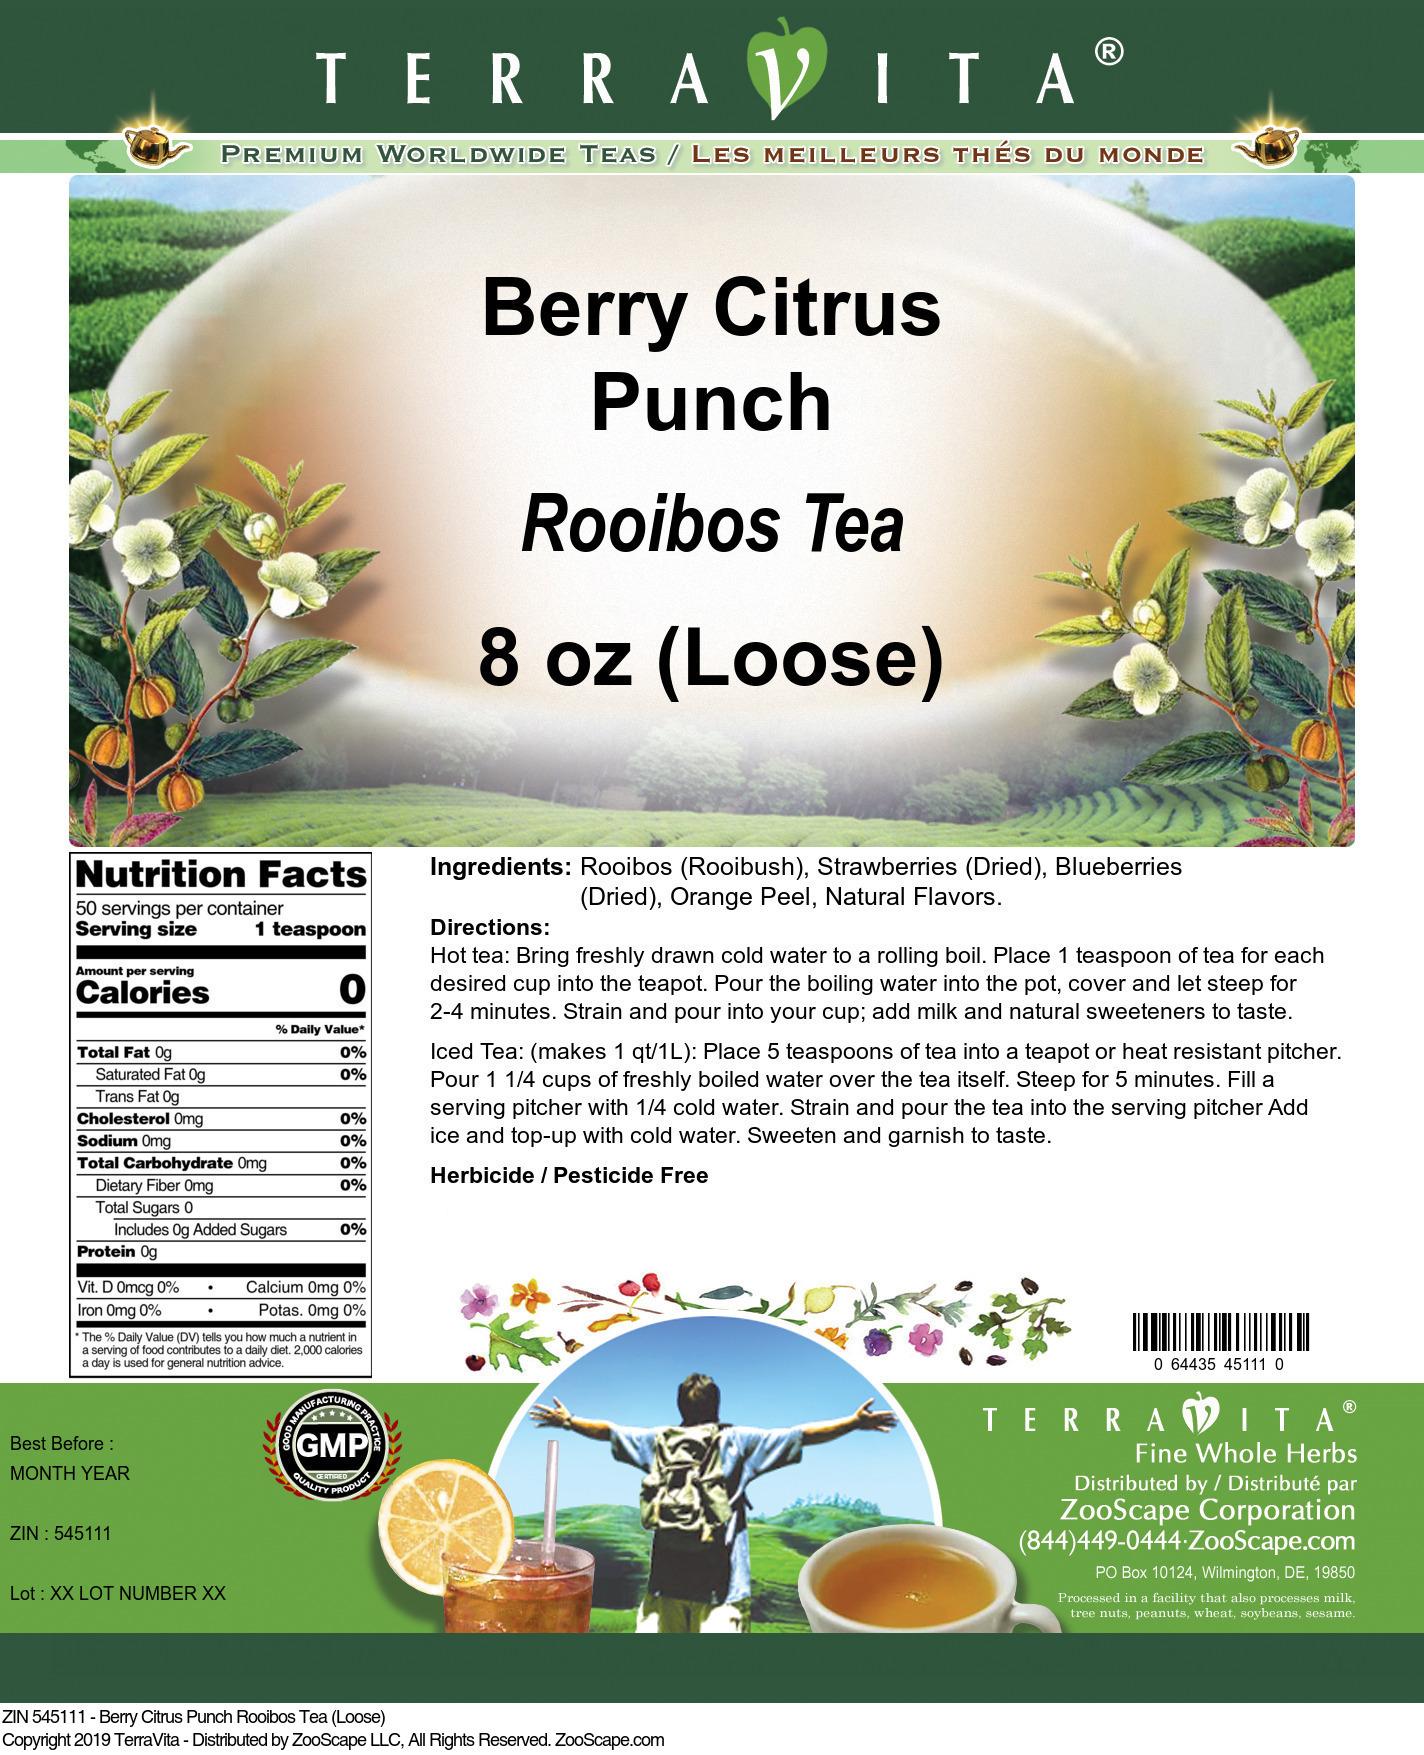 Berry Citrus Punch Rooibos Tea